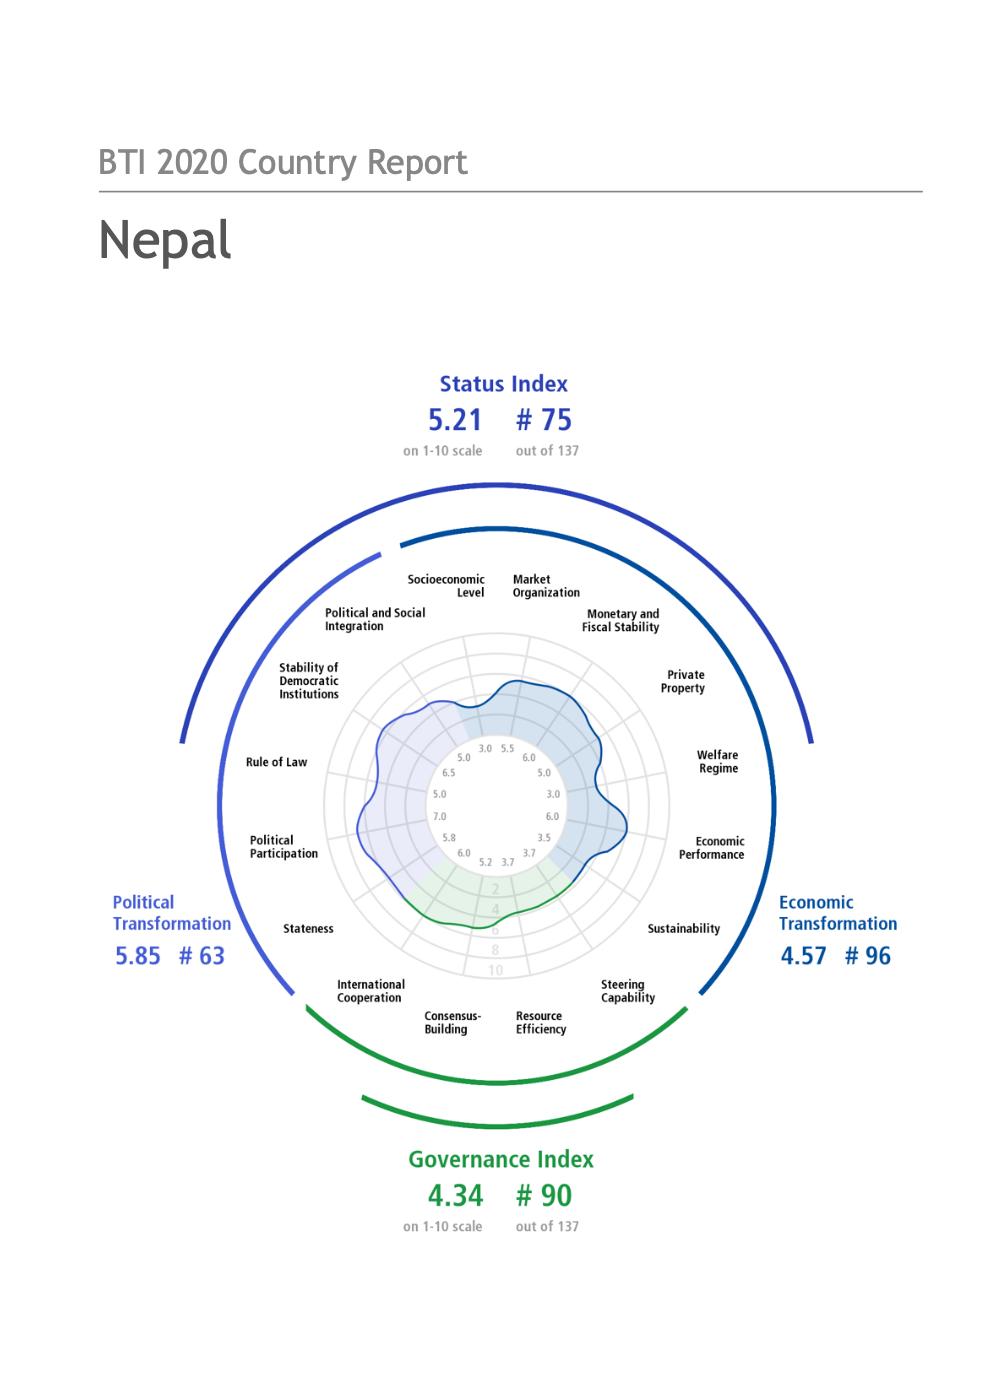 BTI 2020 Country Report Nepal